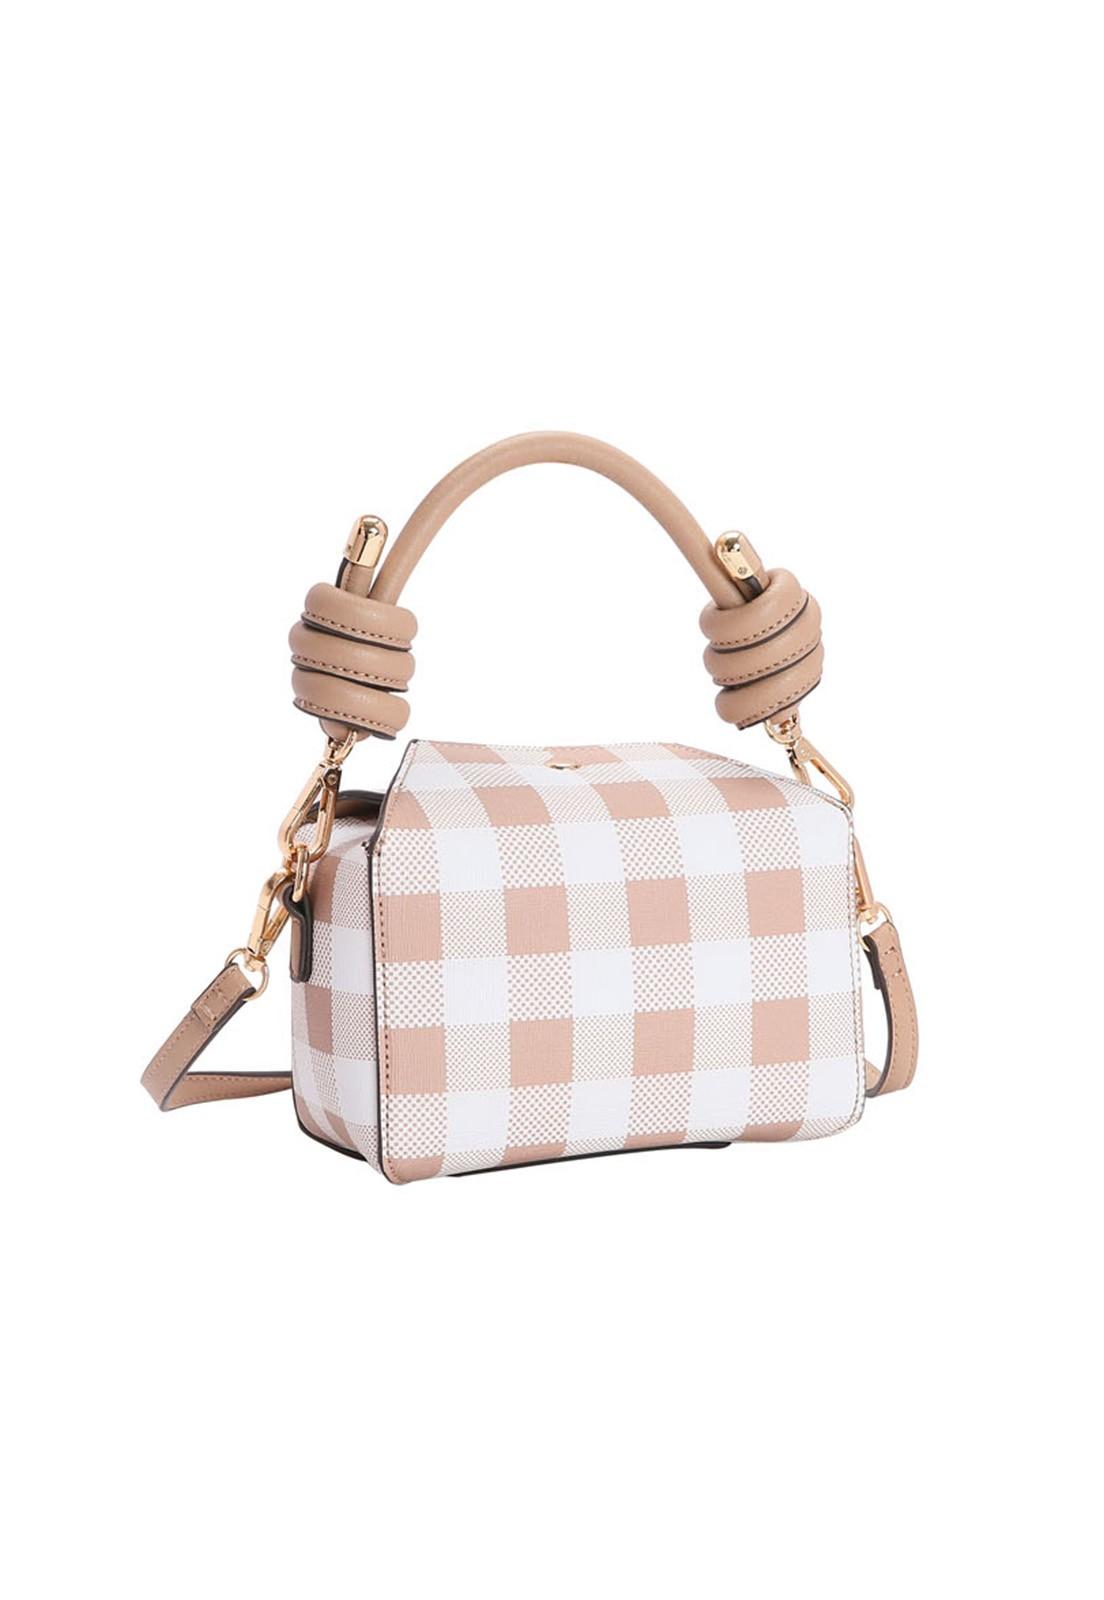 Bolsa Feminina Chenson Mini Bag de Mão - Transversal 3483290